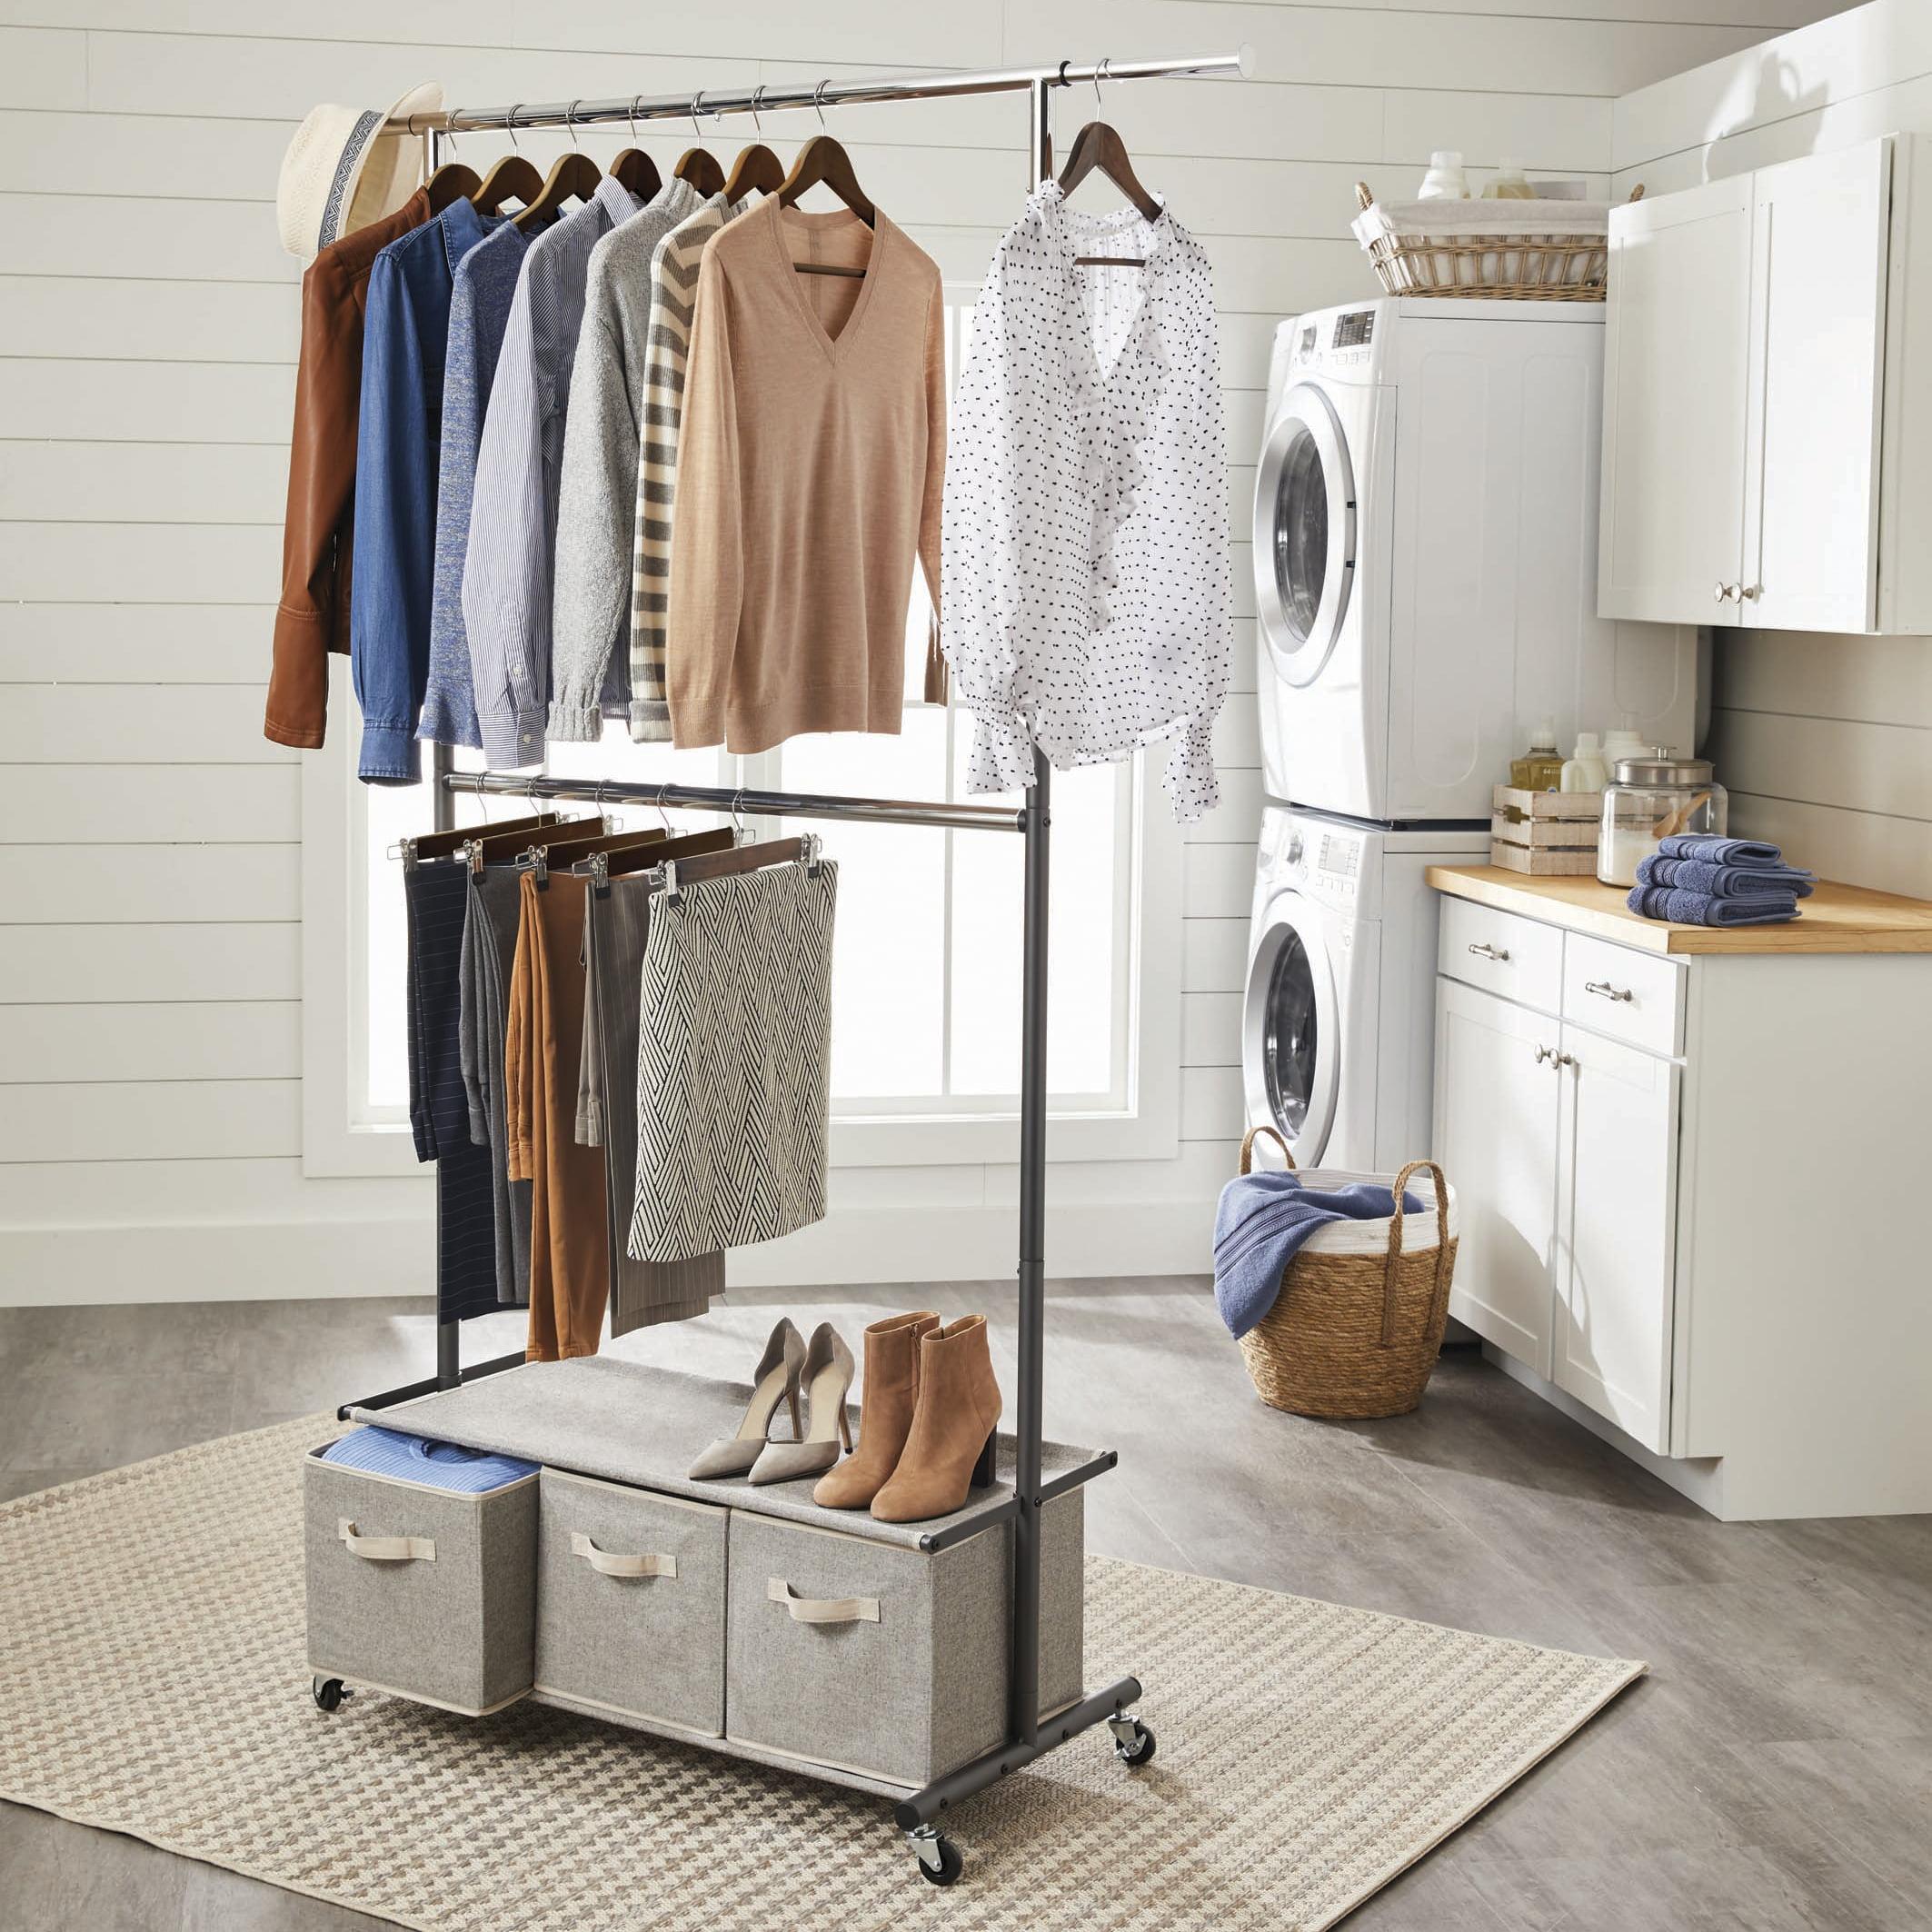 Better Homes Gardens 2 Tier Garment Rack With 3 Drawer Closet Organizer Gray Walmart Com